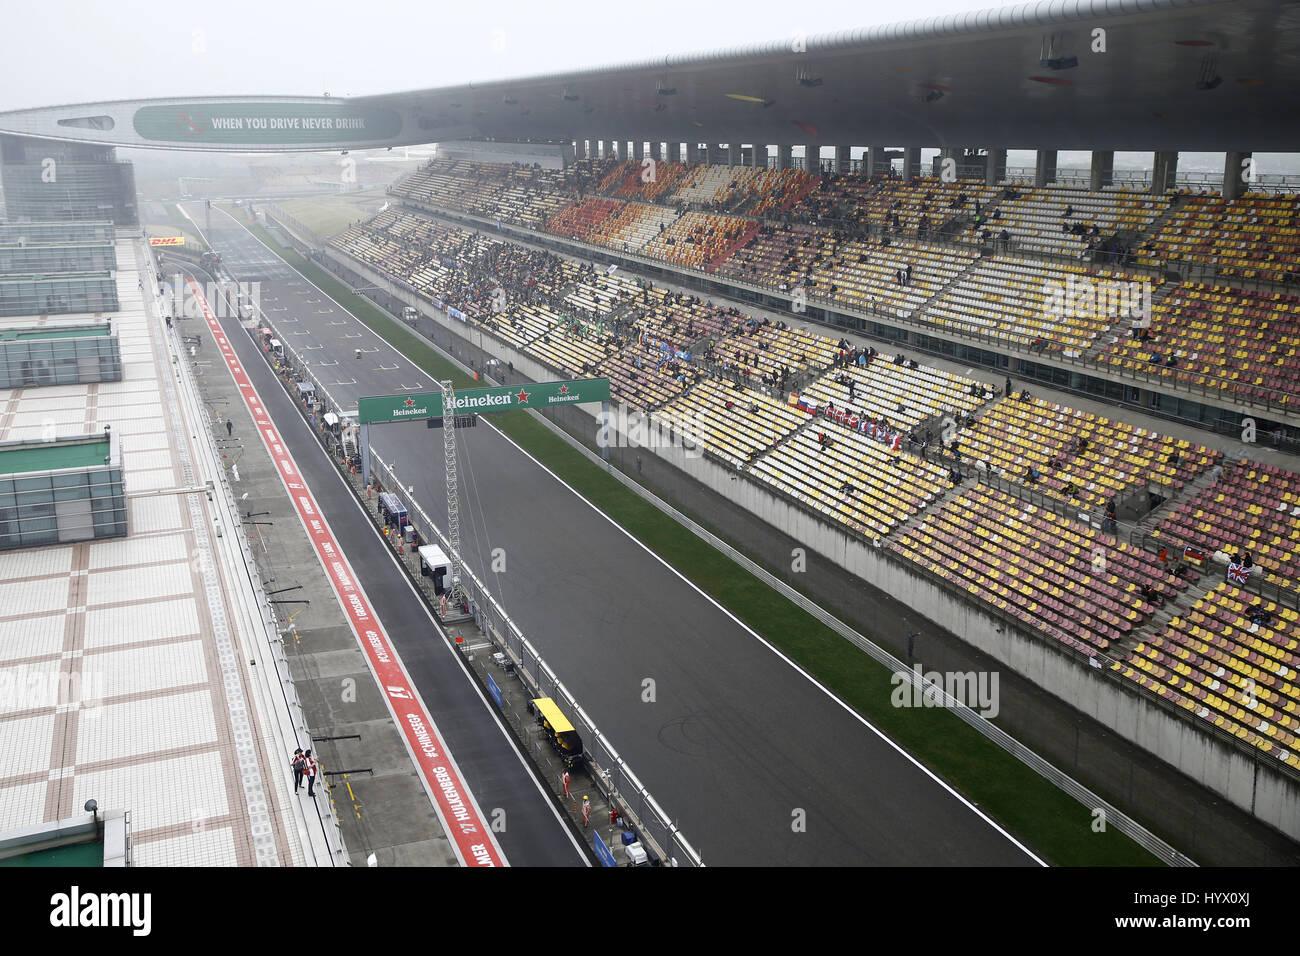 Shanghai, China. 07th Apr, 2017. Motorsports: FIA Formula One World Championship 2017, Grand Prix of AChina, | Credit: - Stock Image